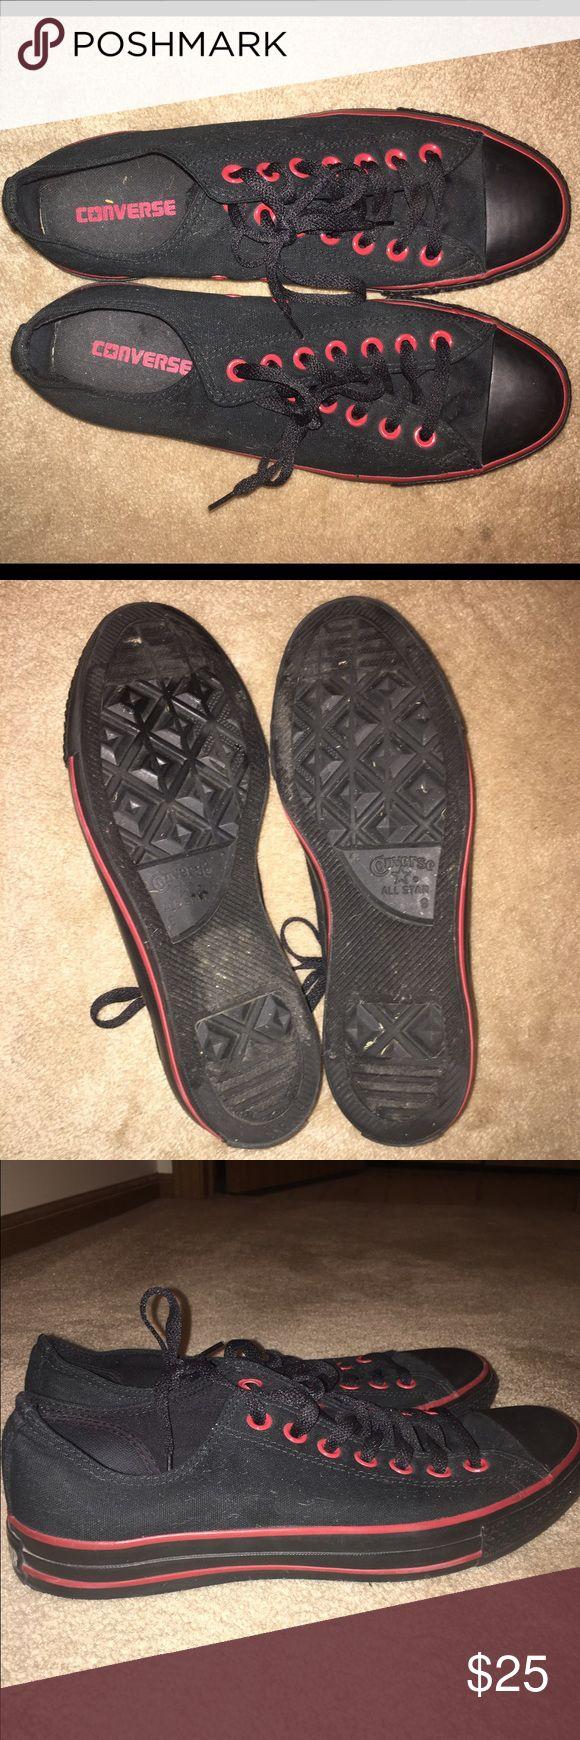 🔴 Men's Converse, size 9. 🔴 Men's Converse, size 9. Like new condition! Converse Shoes